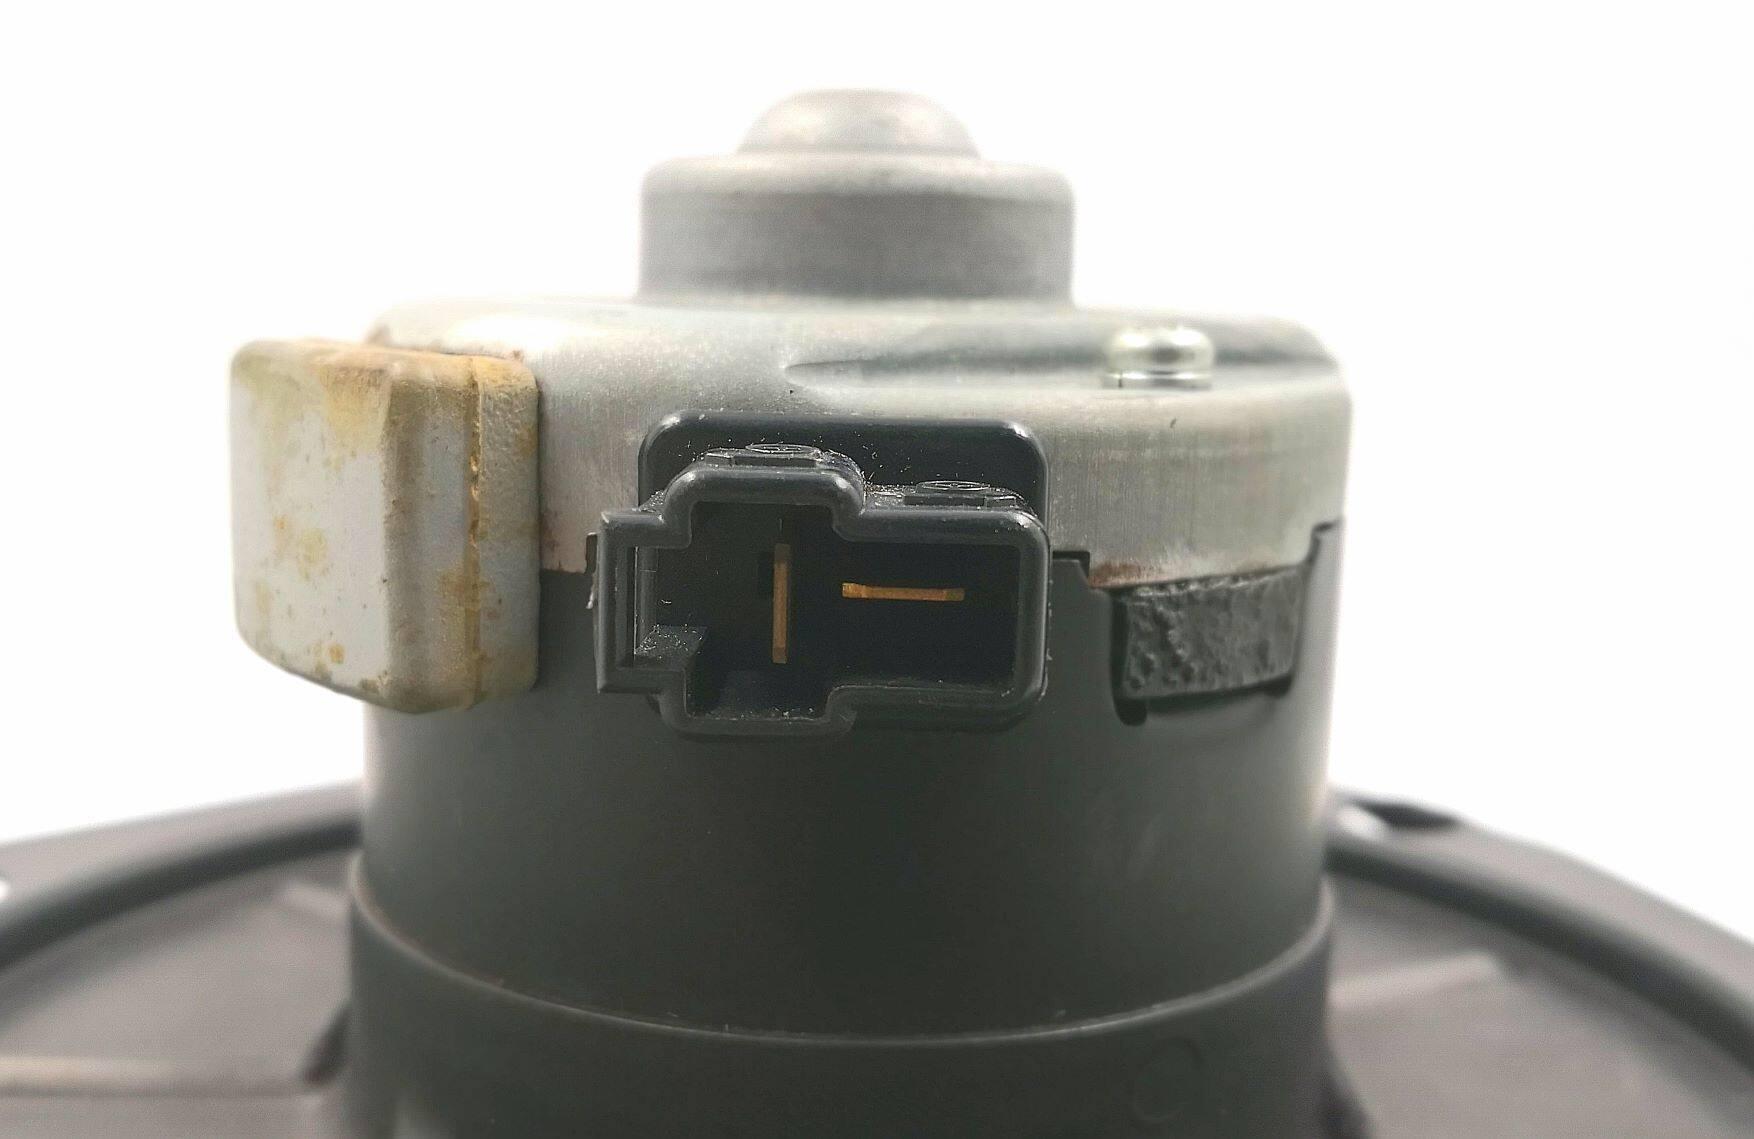 MOBLNDMCAN0131 - MITSUBISHI CANTER / FUSO 24V DENSO BLOWER MOTOR ( ORG ) 282500-0131